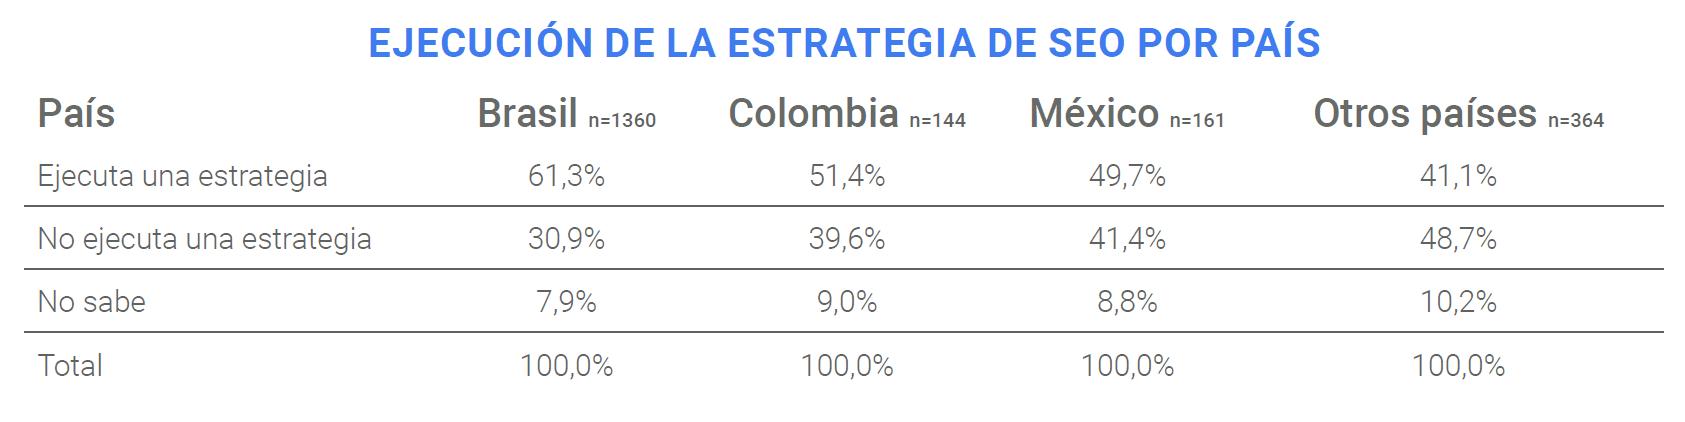 invertir en una estrategia SEO en México